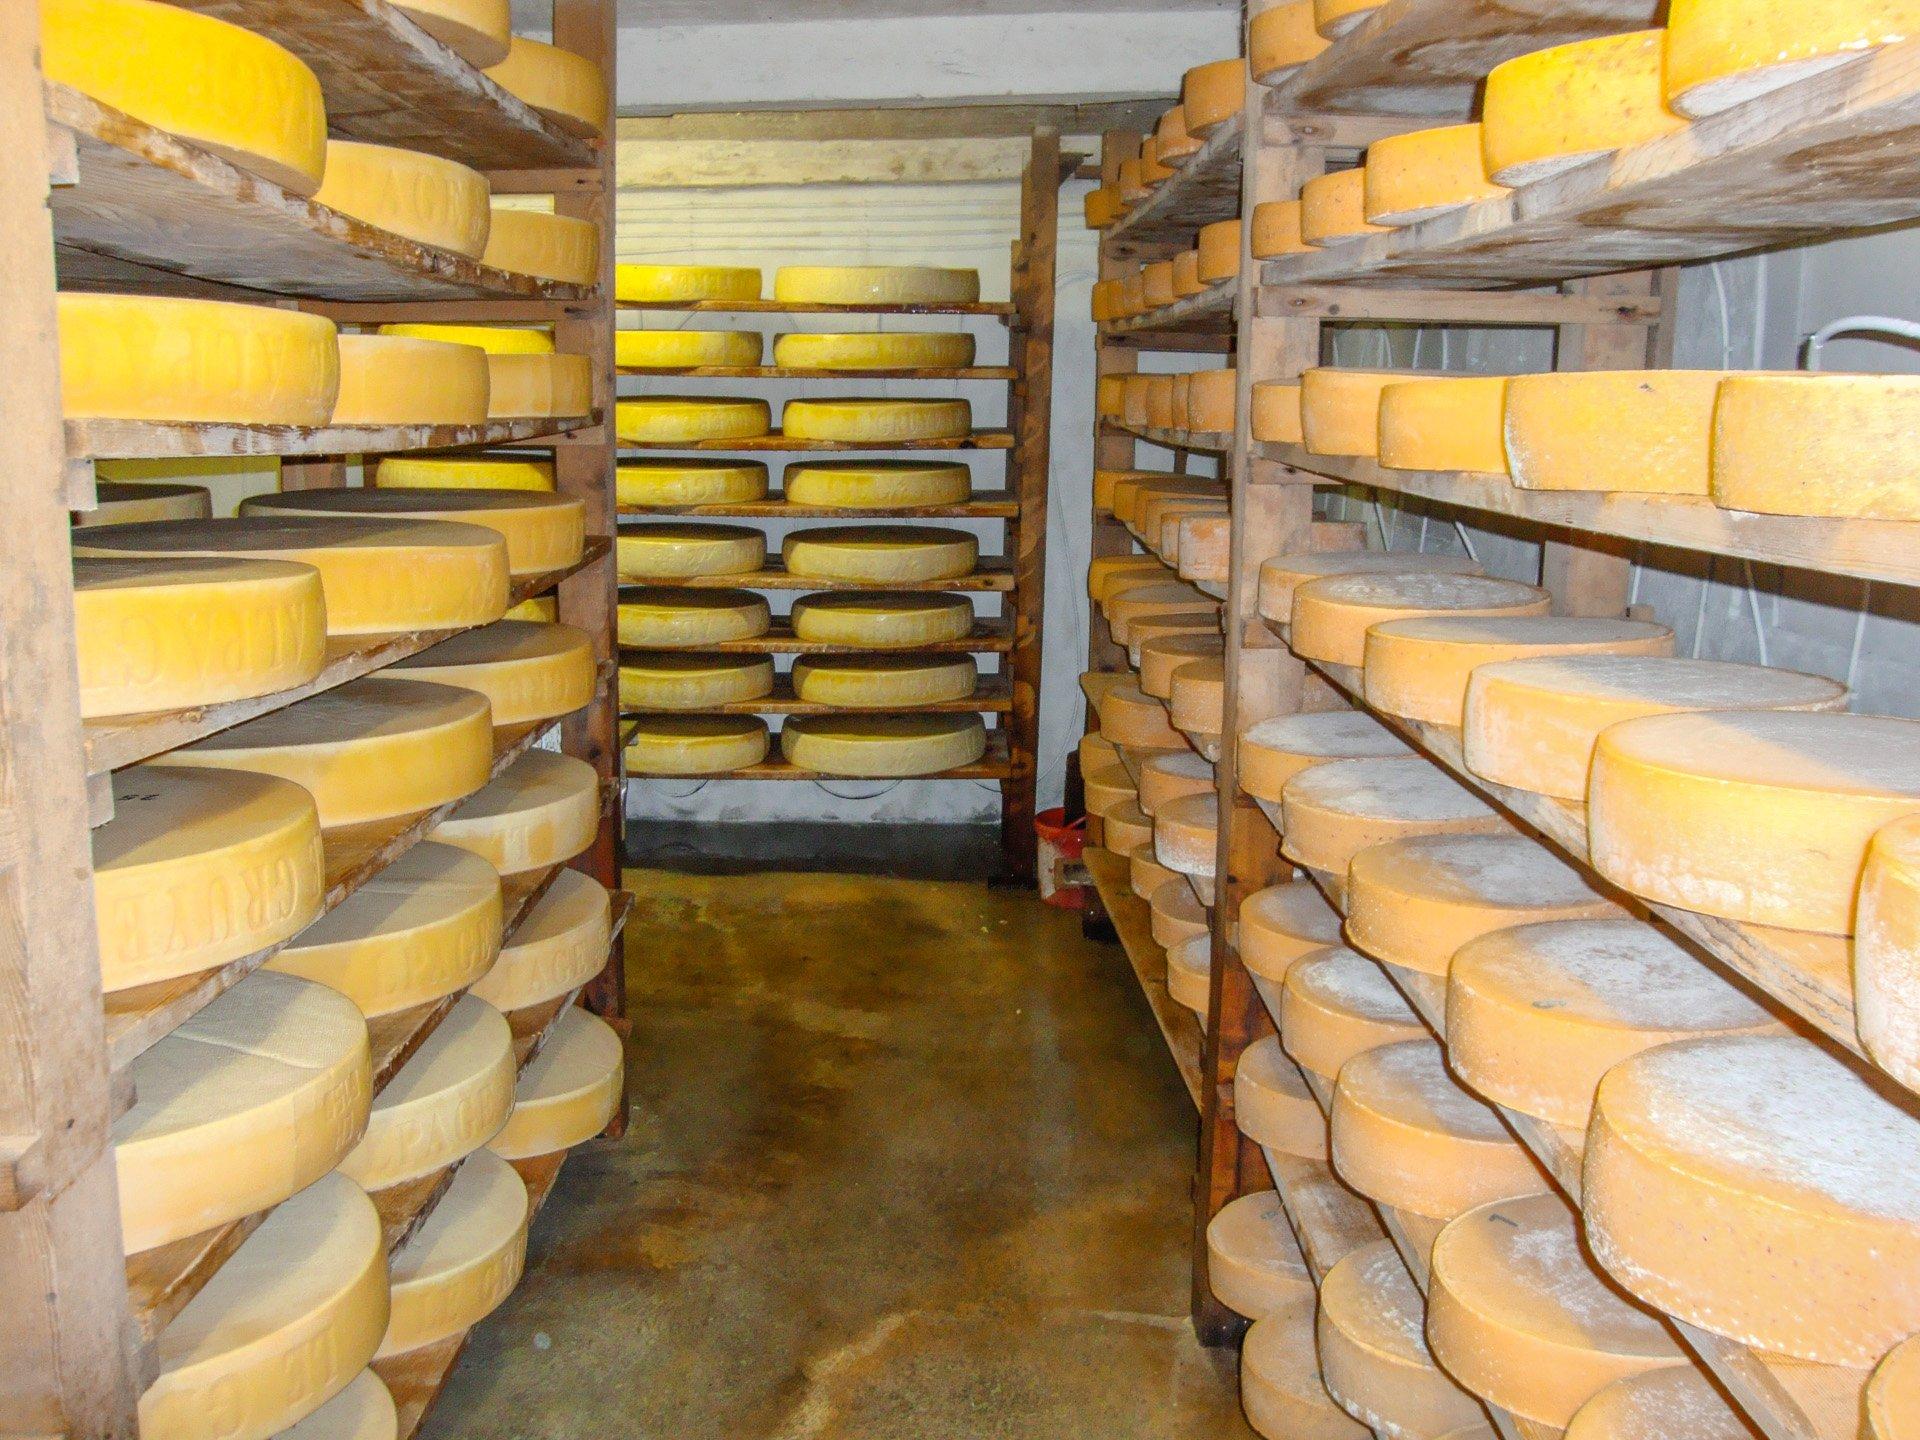 Cheese Making Tours in Switzerland